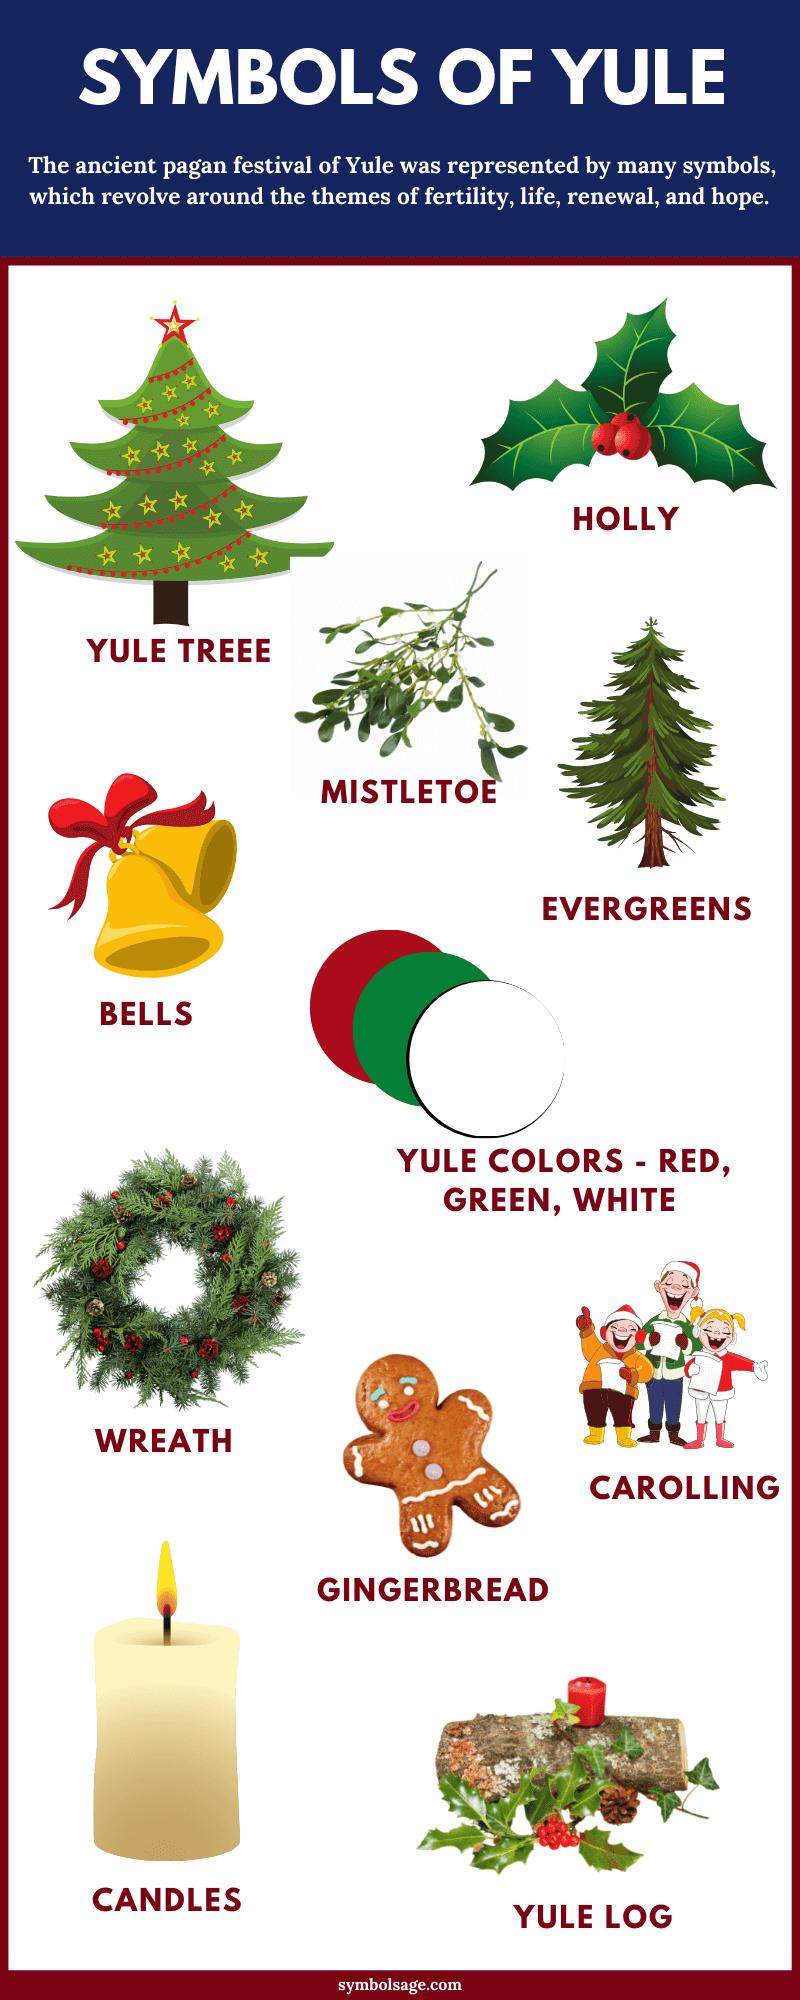 Symbols of yule